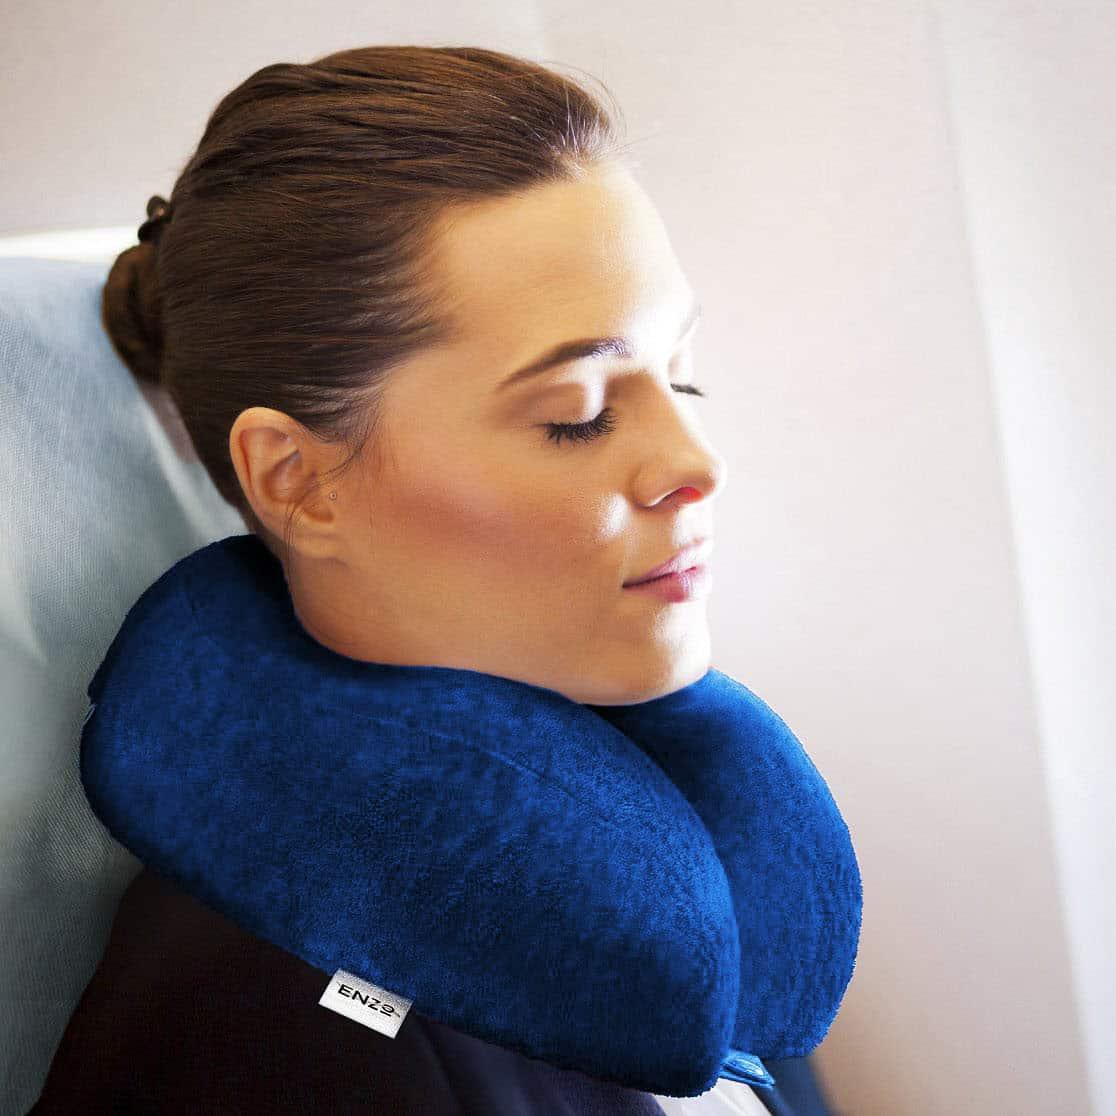 Midnight Sky Blue Premium Travel Pillow Enzo Shop Get